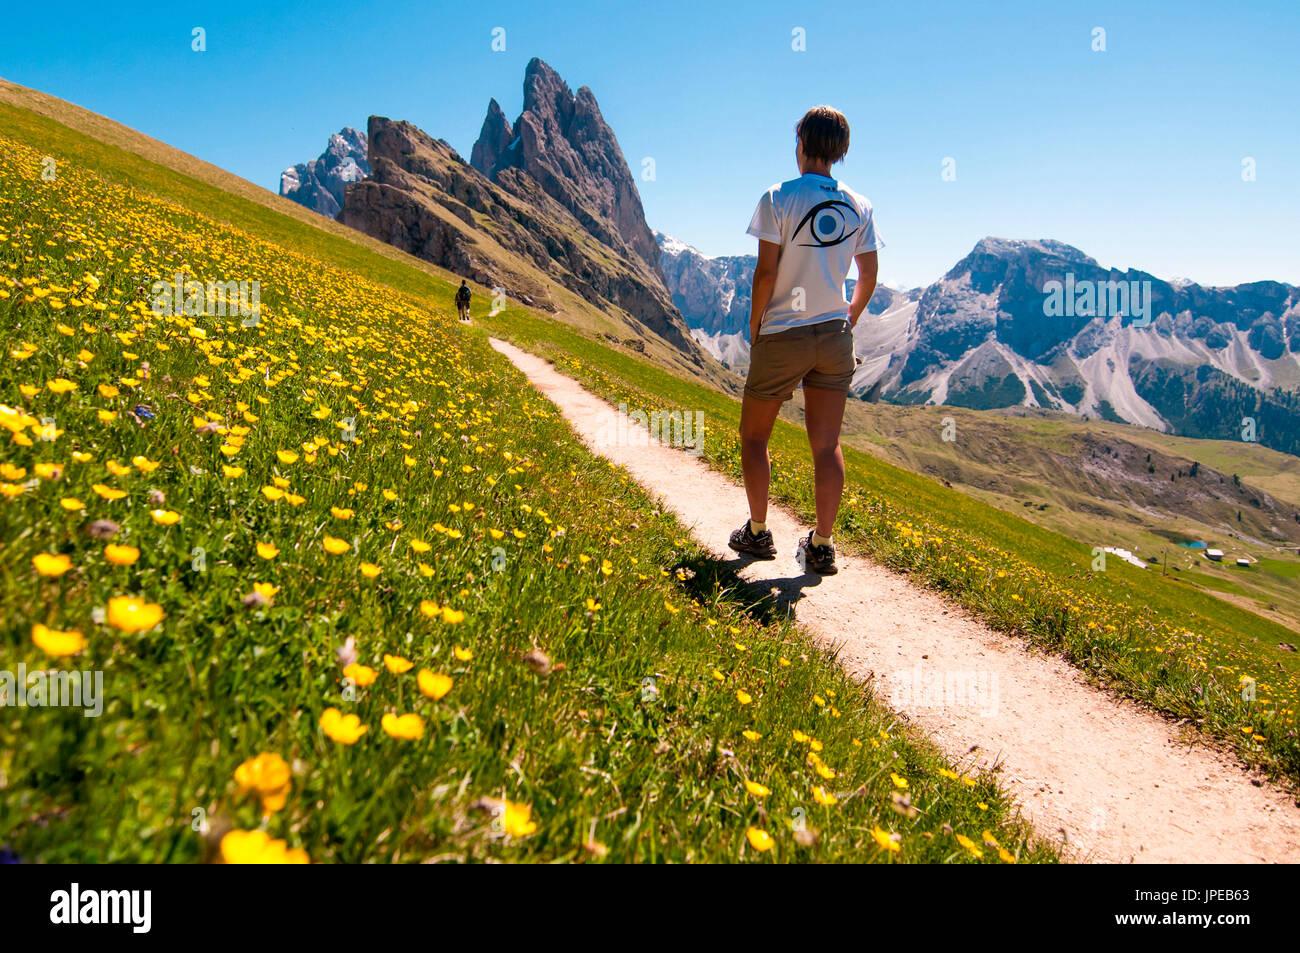 Trekker on the trail in the panorama of Seceda Mountains. Dolomiti, Trentino Alto Adige, Italy - Stock Image